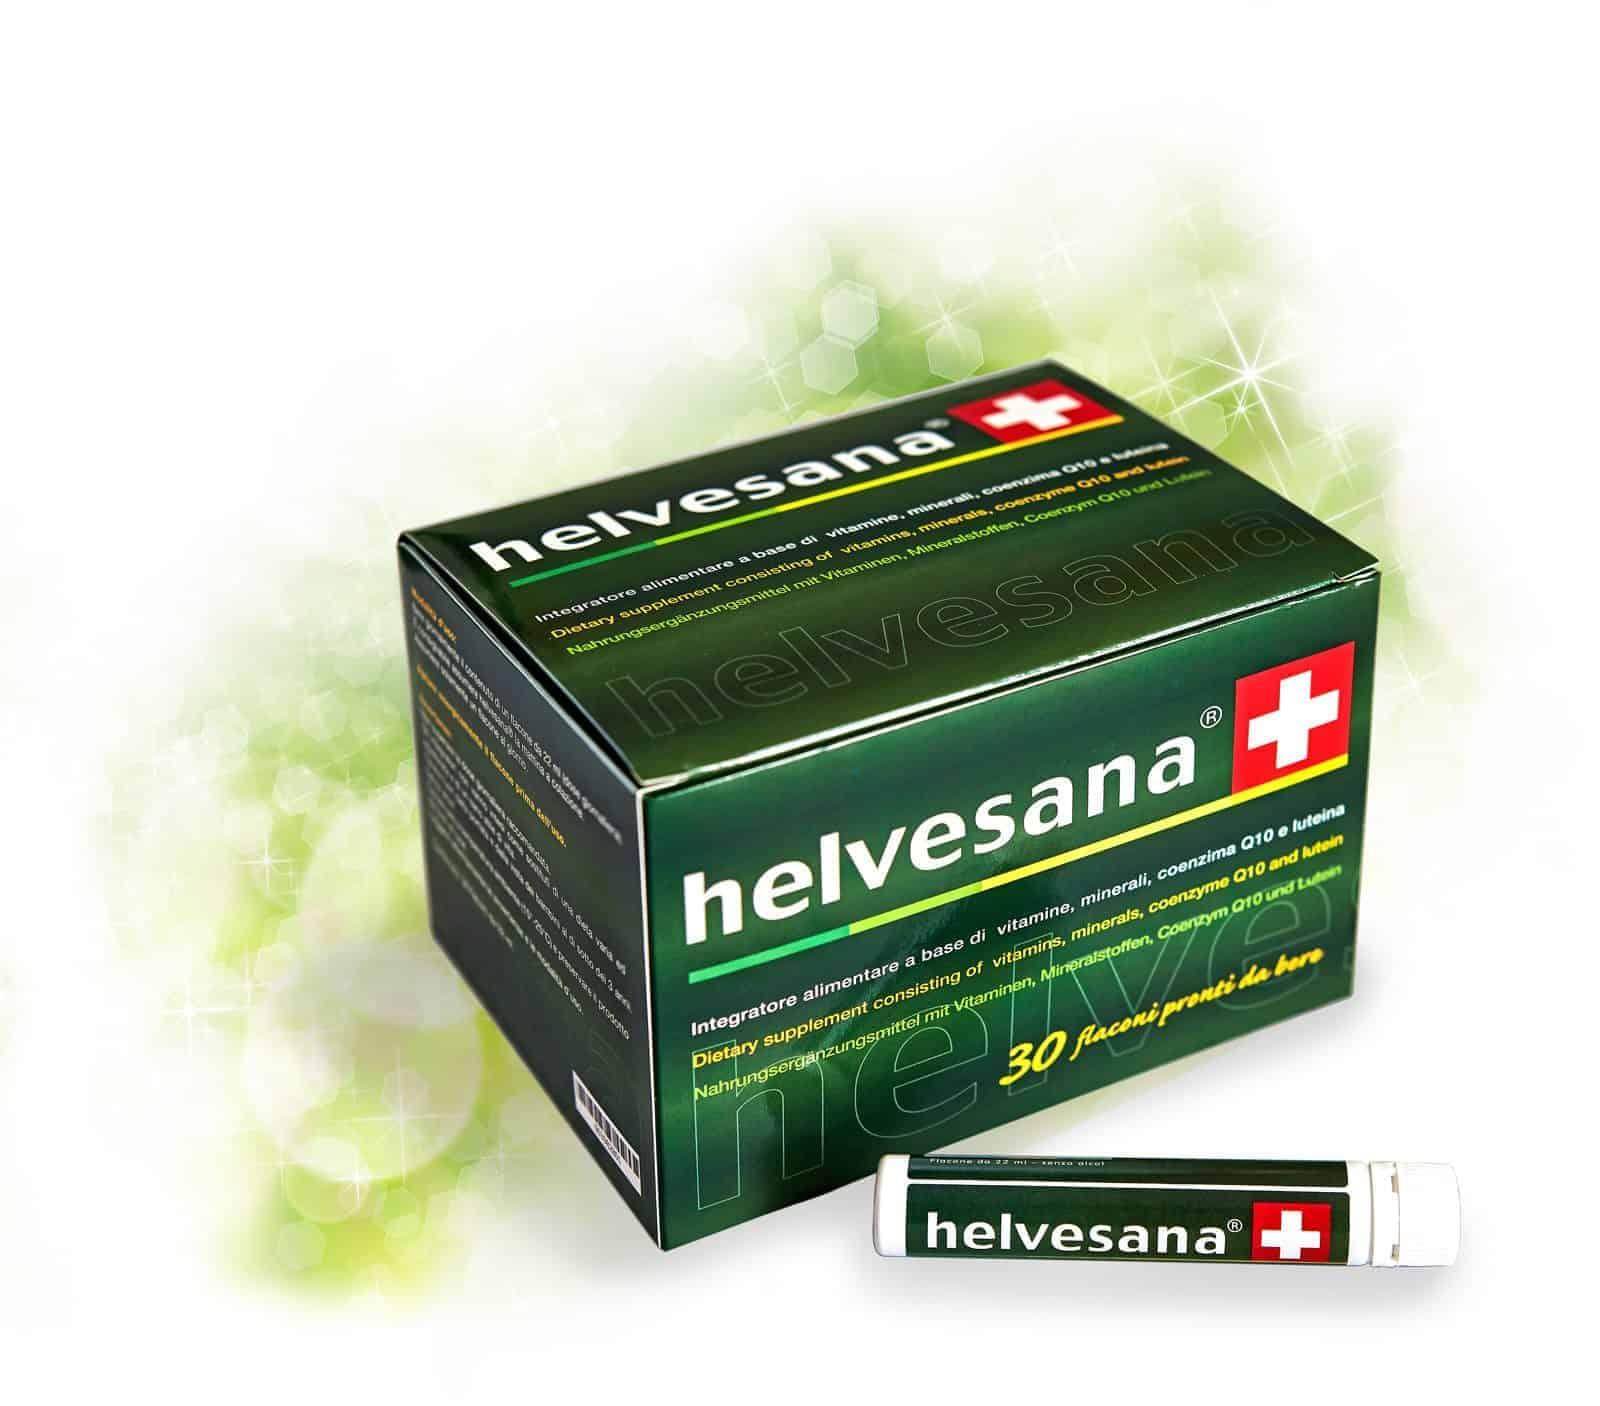 Helvesana, esseline